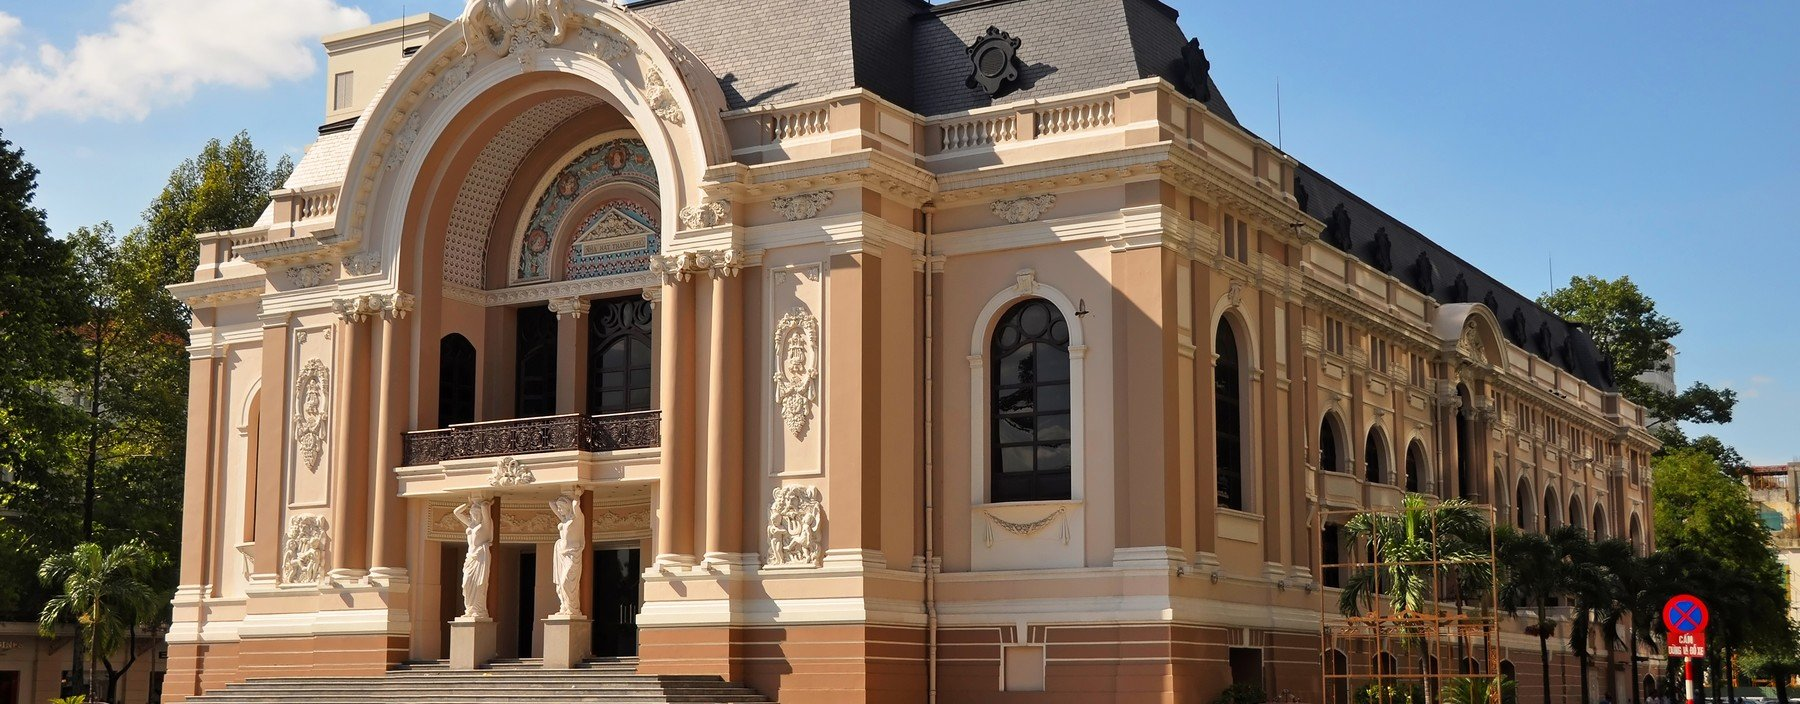 vn, ho chi minh city, opera house (2).jpg